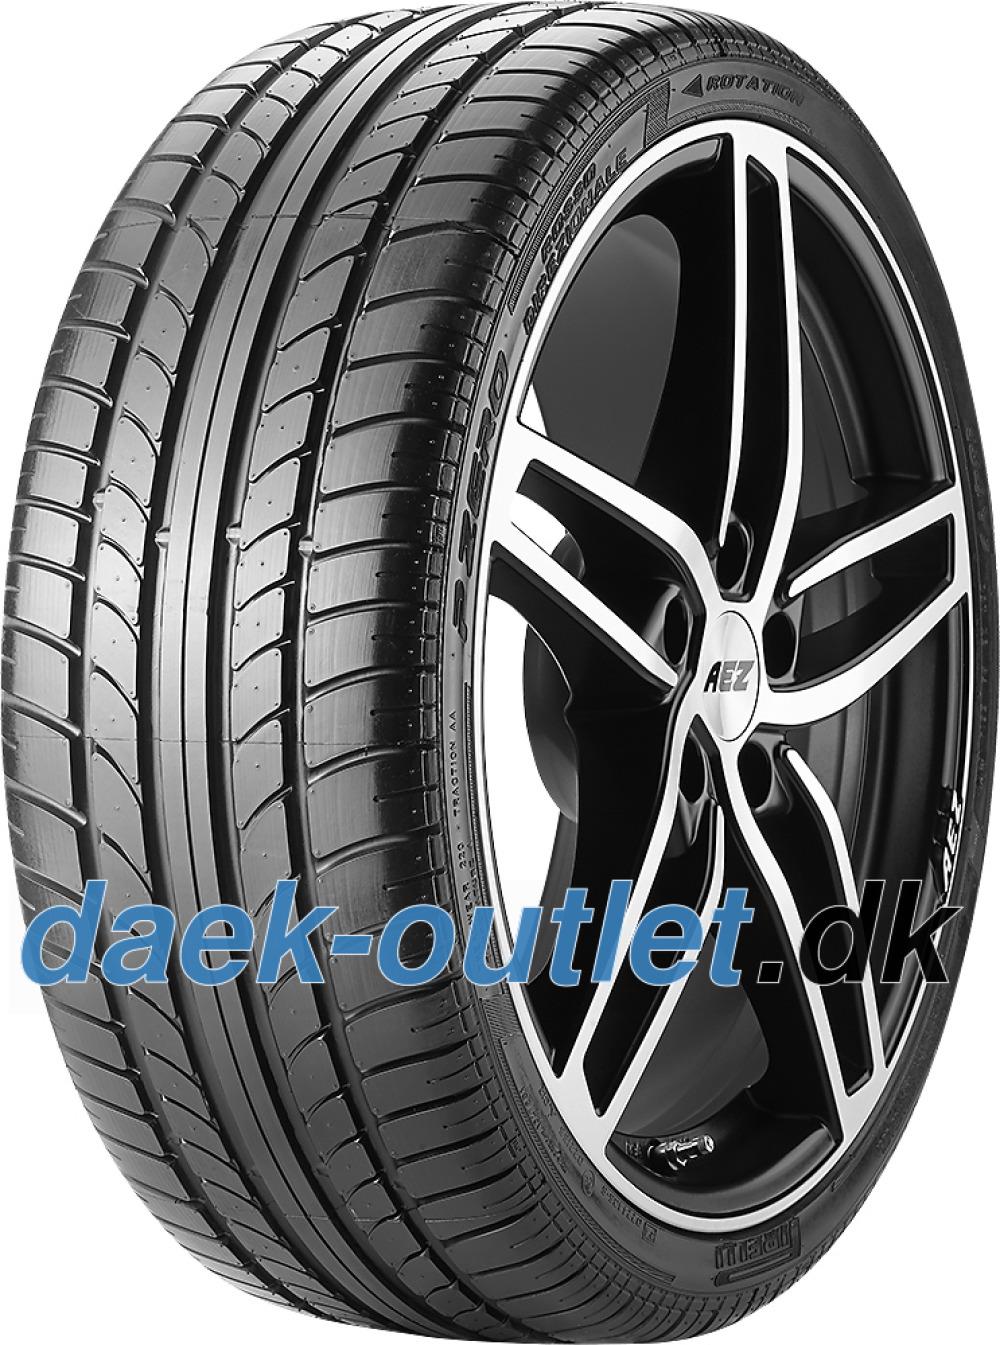 Pirelli P Zero Corsa Direzionale ( 235/35 ZR19 (91Y) XL L, med fælgbeskyttelse (MFS) )